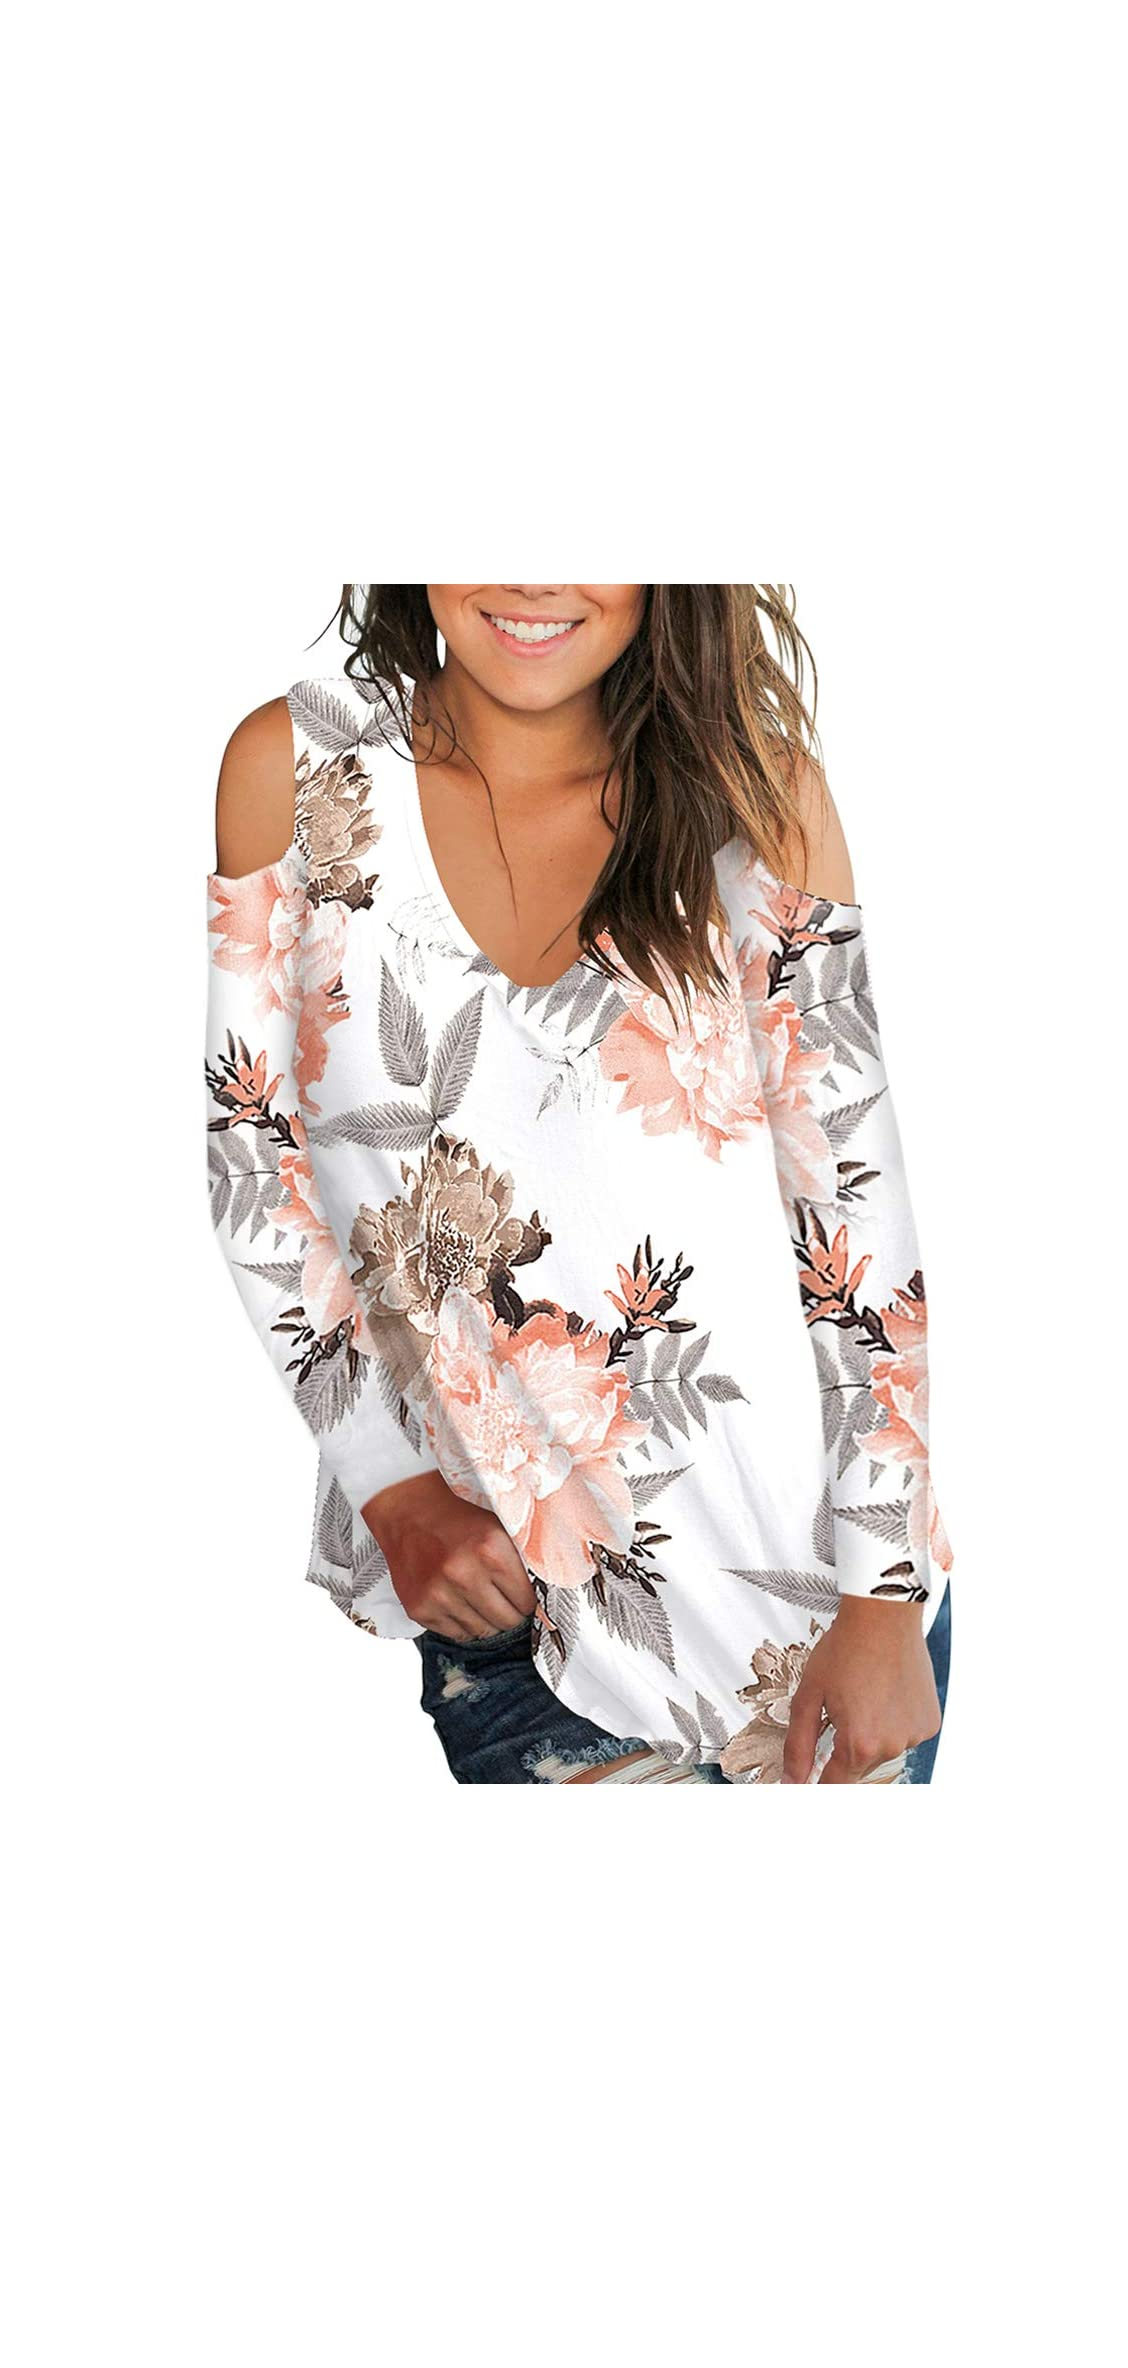 Women's Casual T Shirt V Neck Cold Shoulder Tops